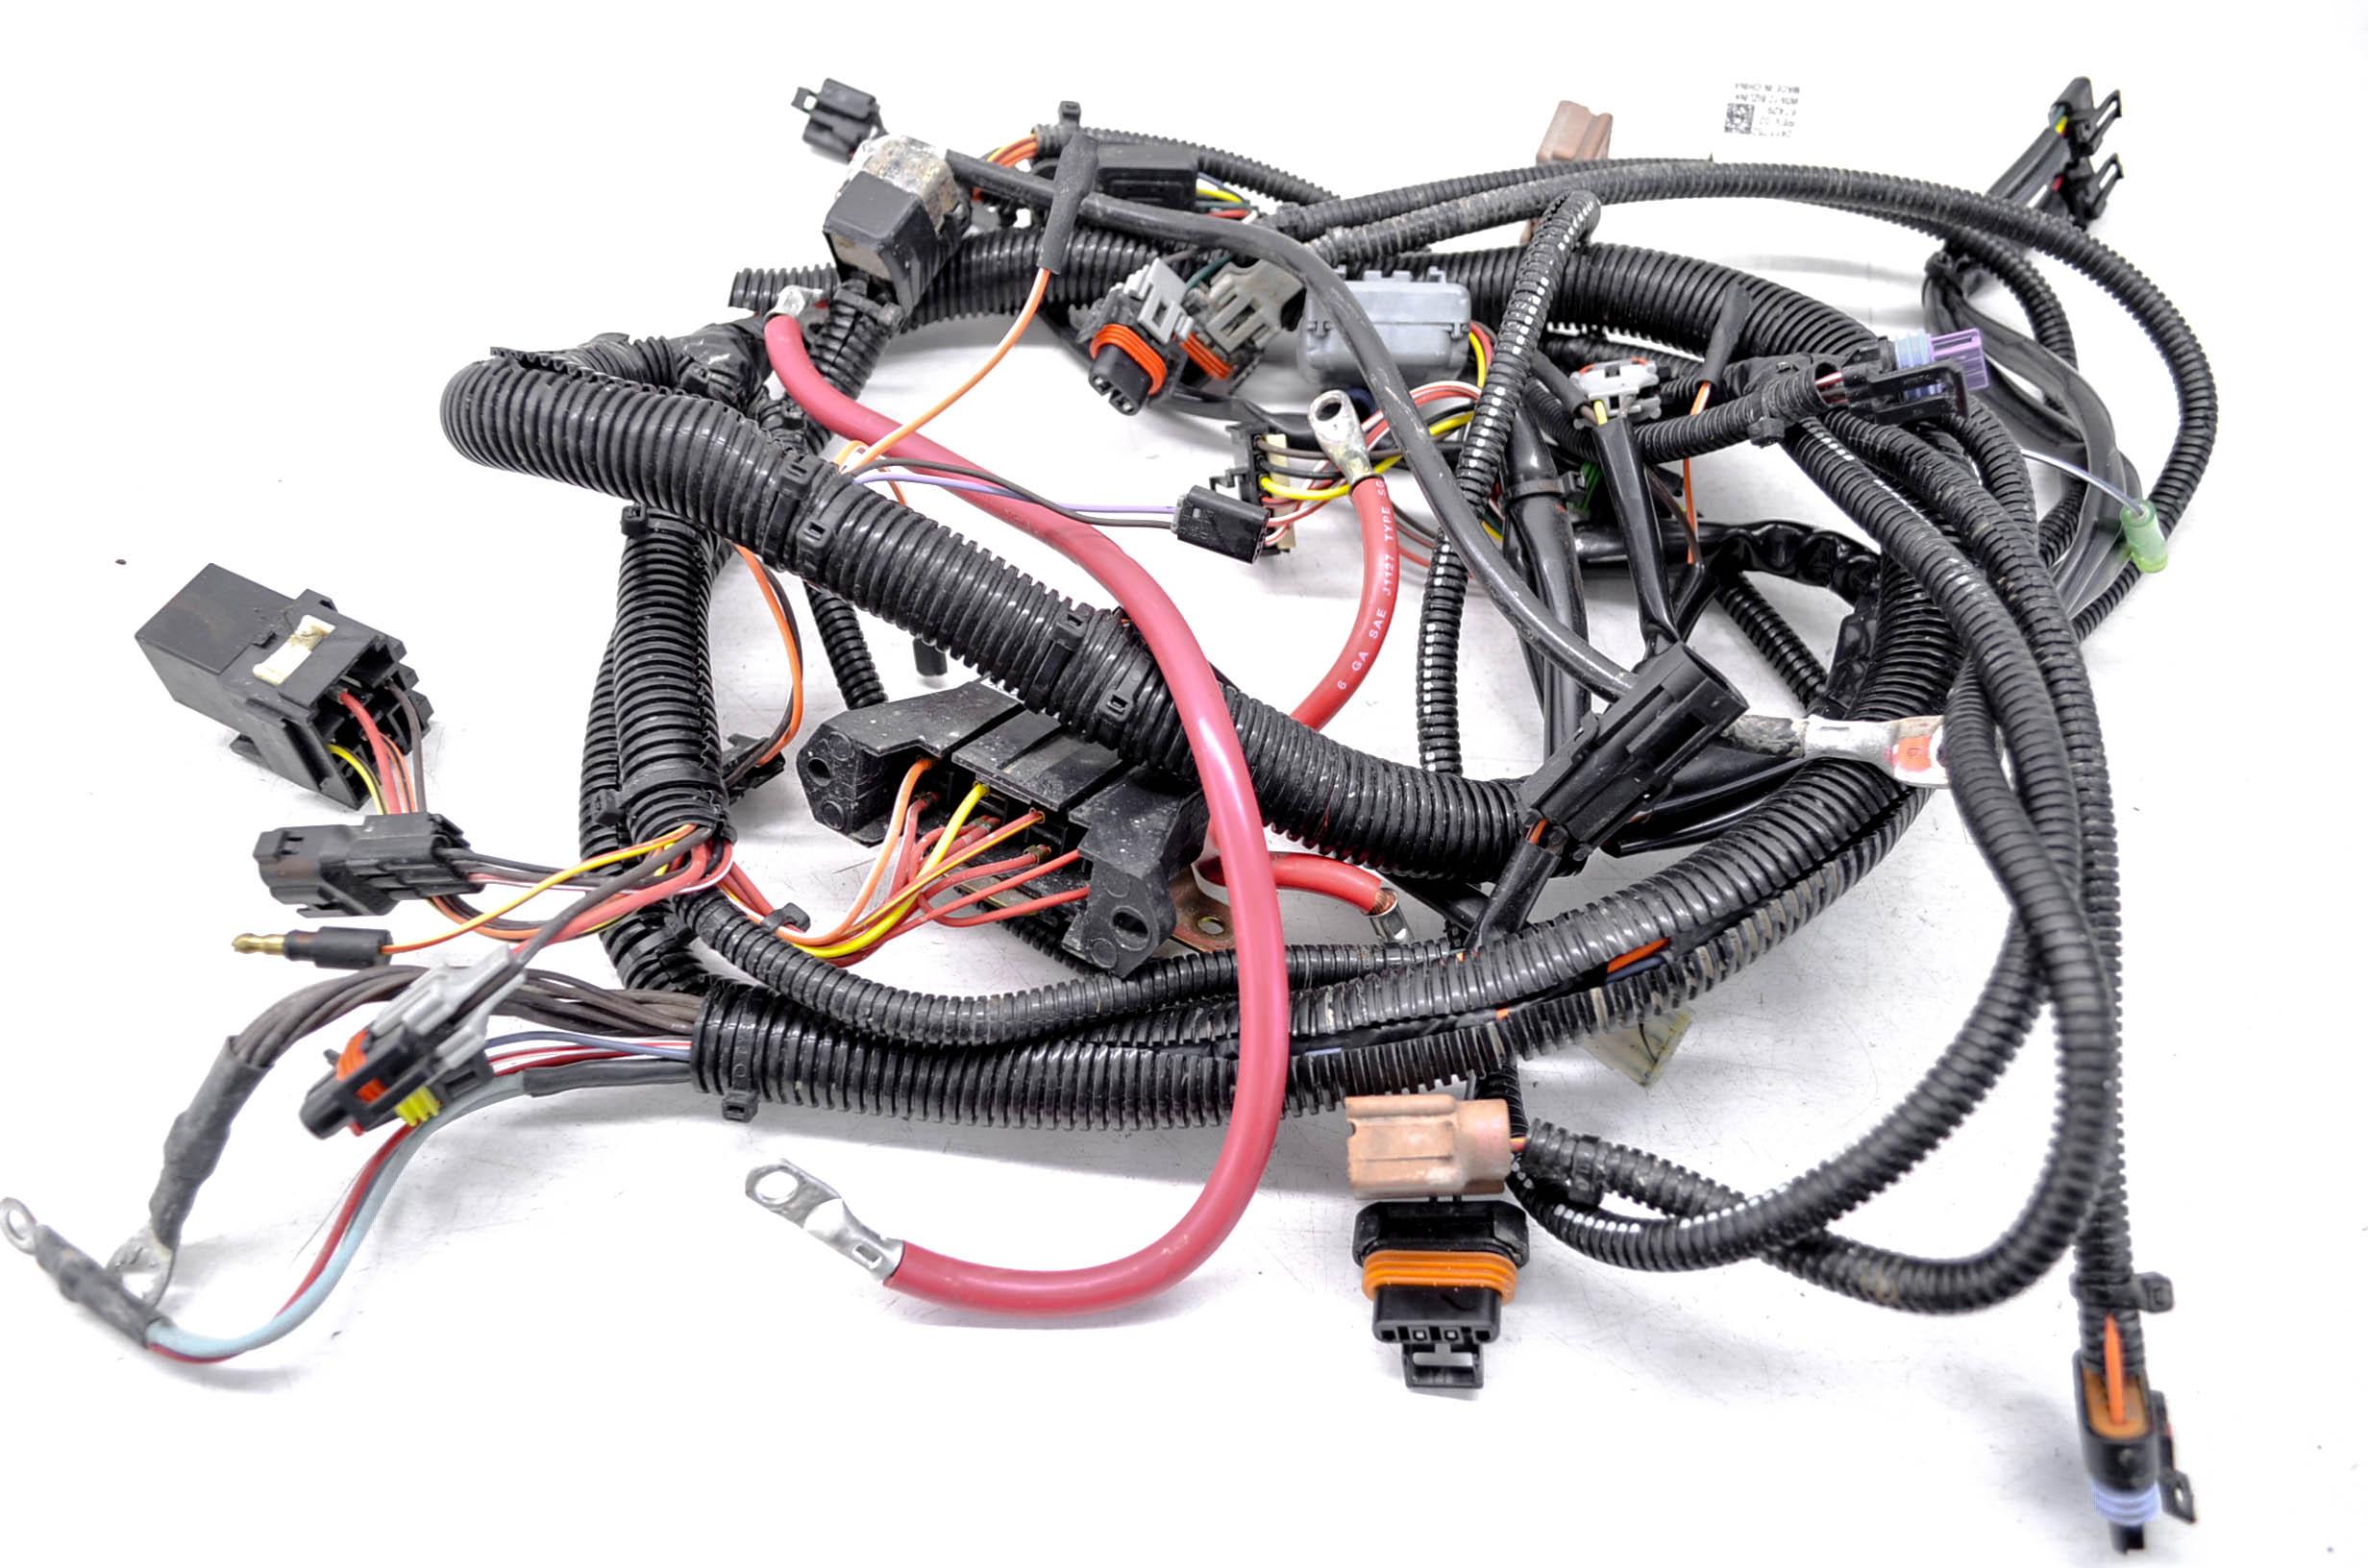 13 Polaris Sportsman 500 Ho 4x4 Wire Harness Electrical Wiring Atv